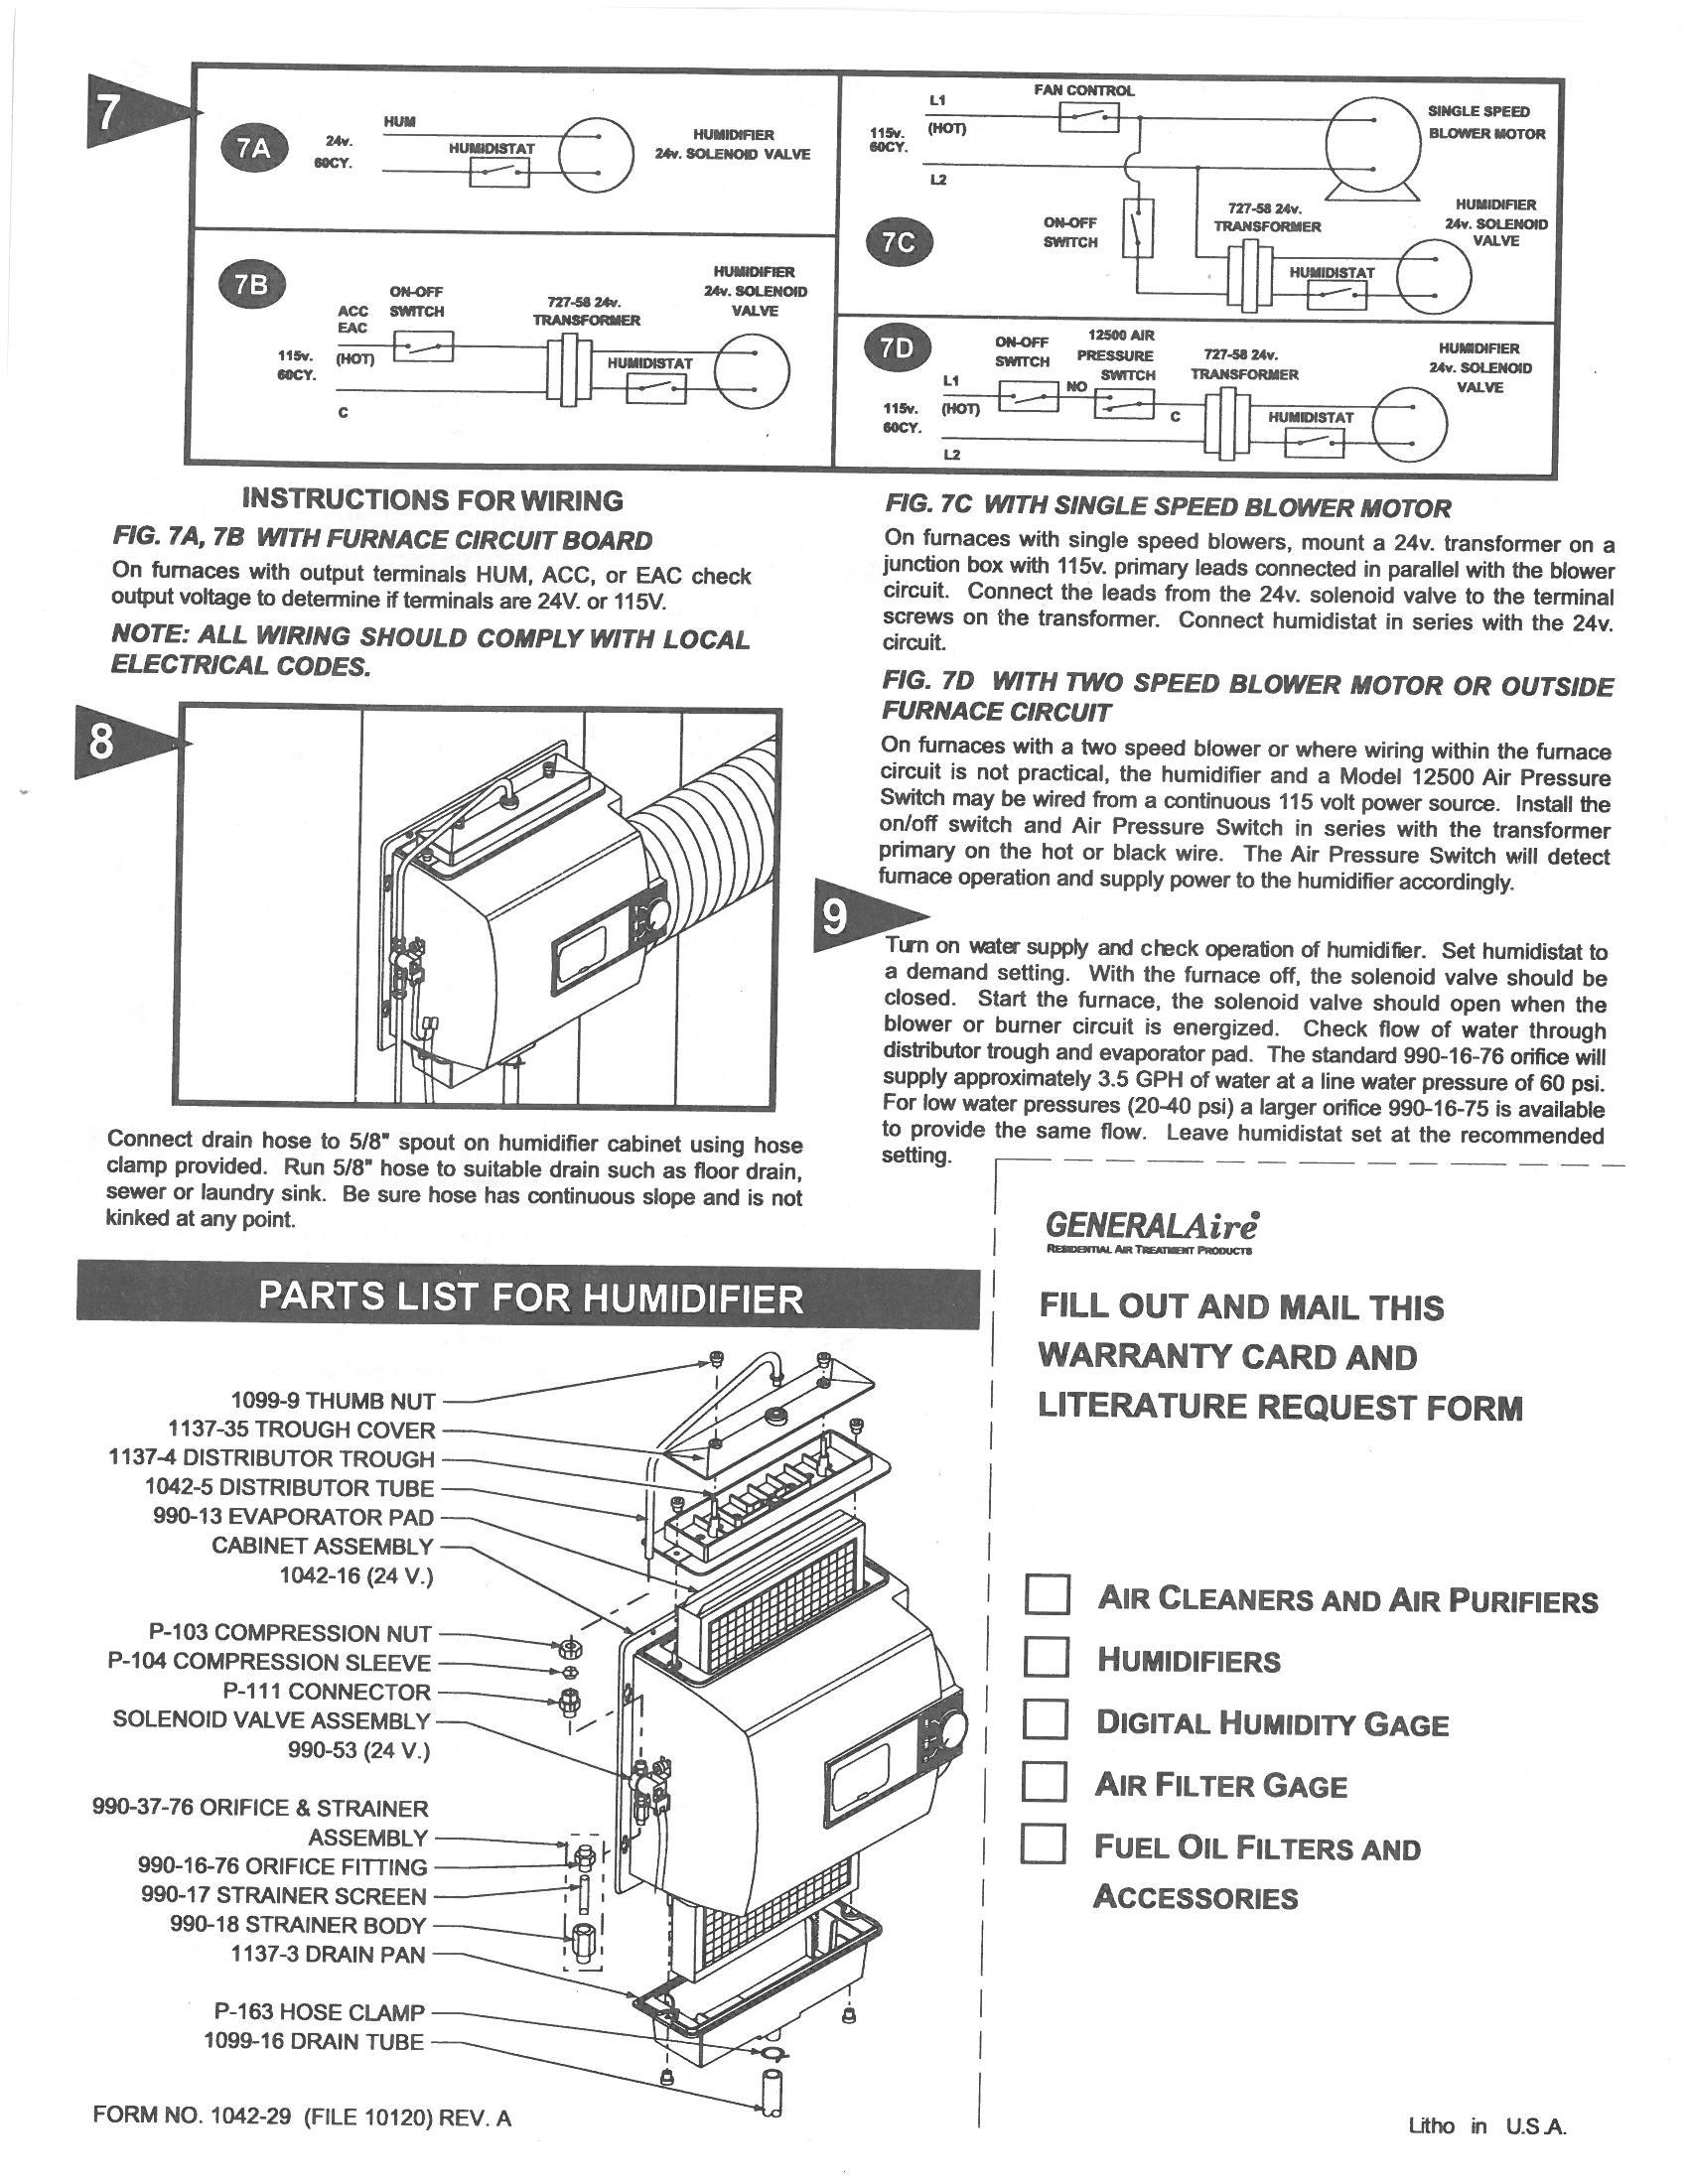 furnace wiring diagrams 1988 ez go gas golf cart diagram singer get free image about